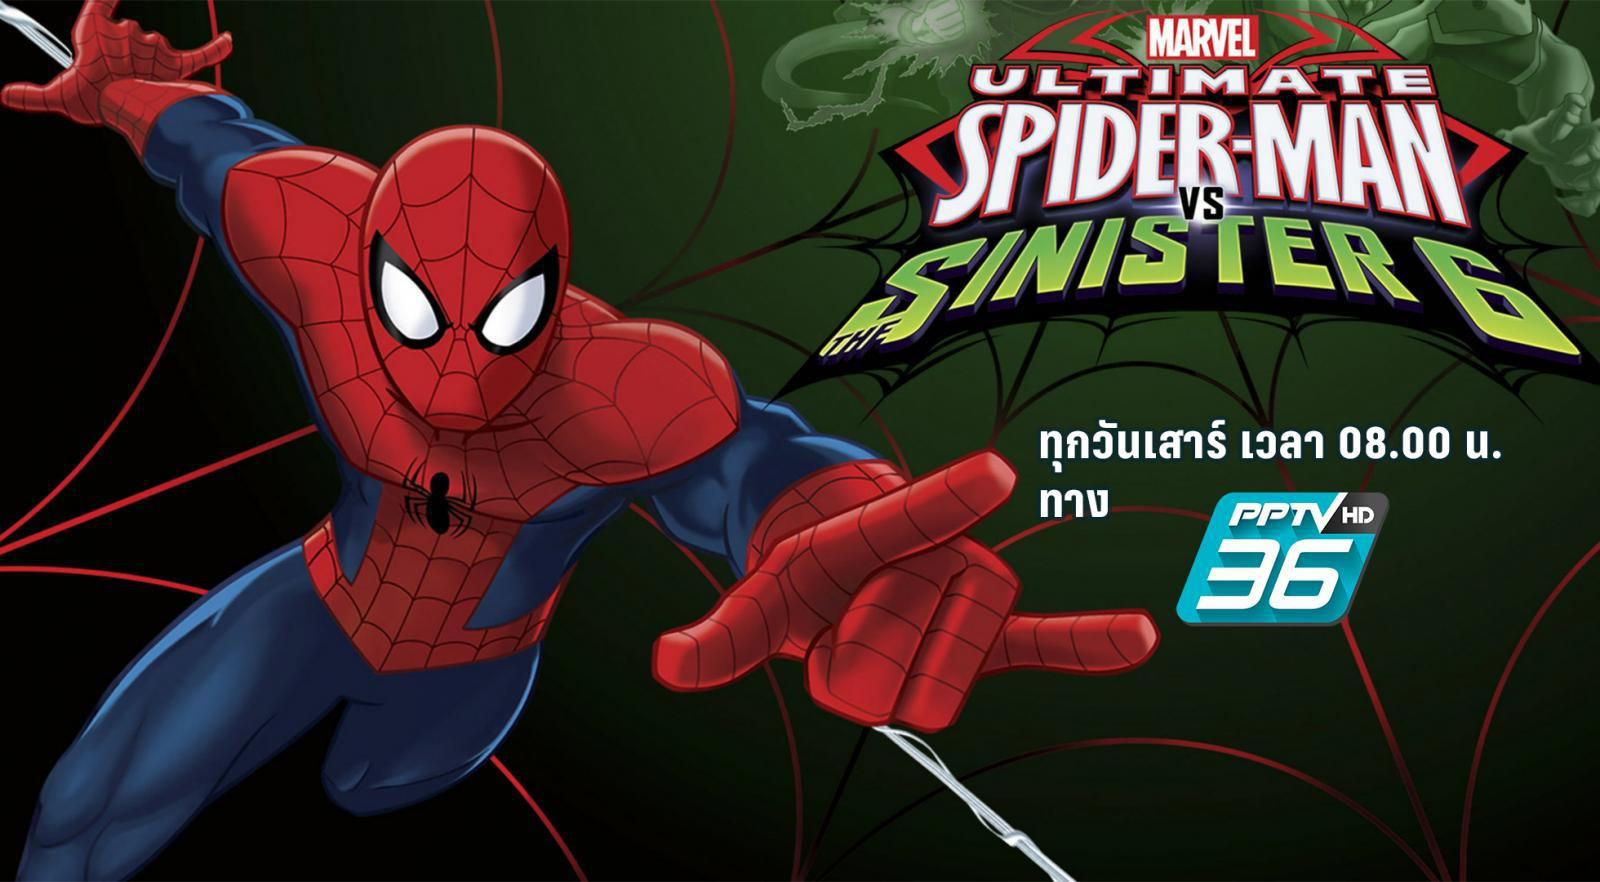 Marvel HQ: Marvel's Ultimate Spider Man Vs. The Sinister 6 อัลติเมท สไปเดอร์แมน ปะทะ วายร้ายซินนิสเตอร์ซิกส์